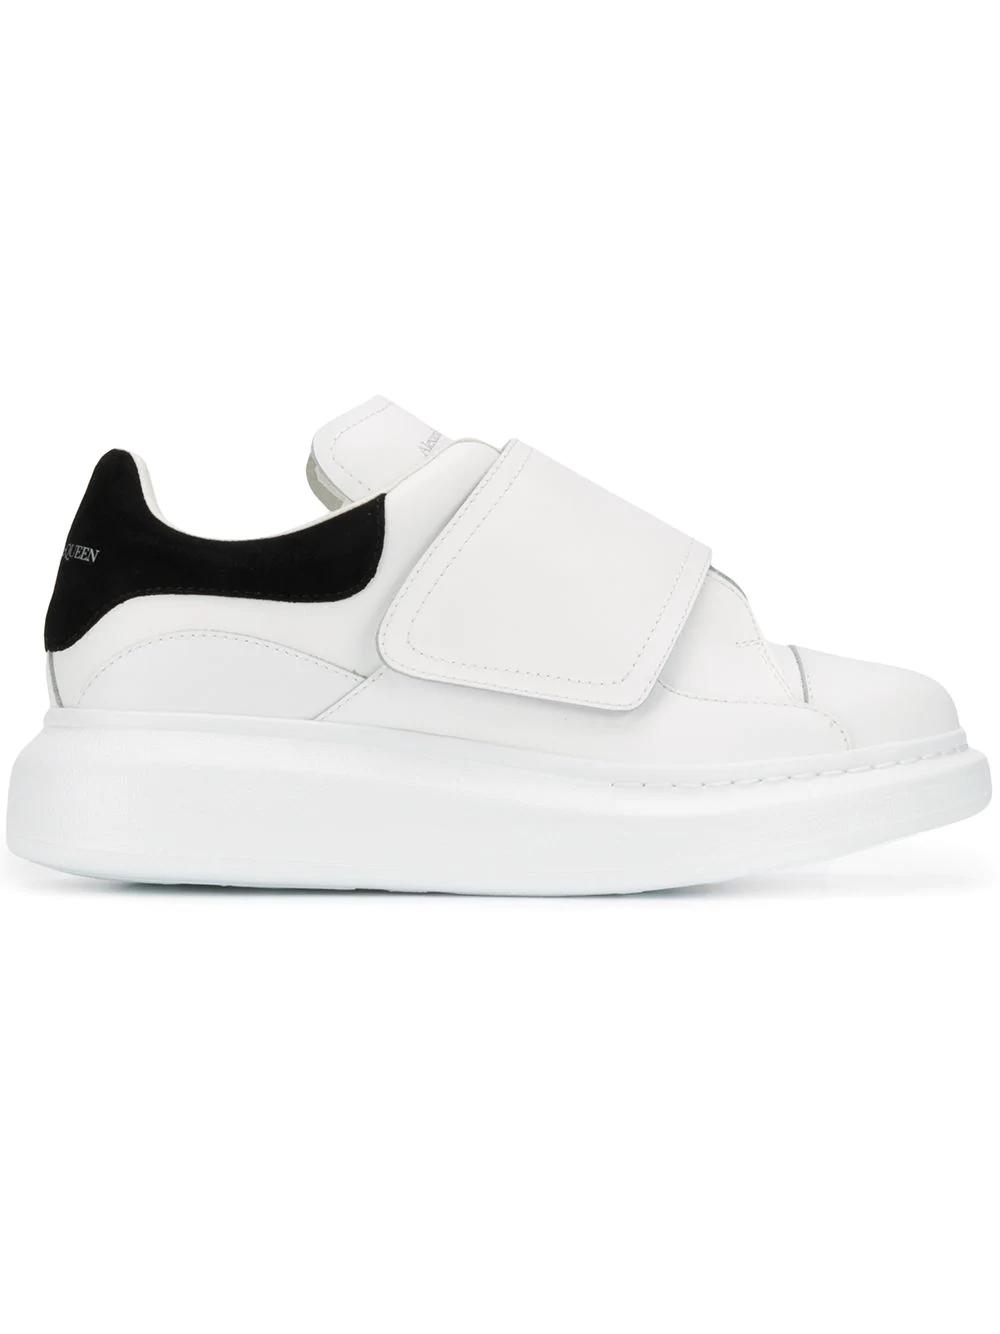 a8f0378dee1d Alexander Mcqueen White Flap Tab Oversized Sneakers